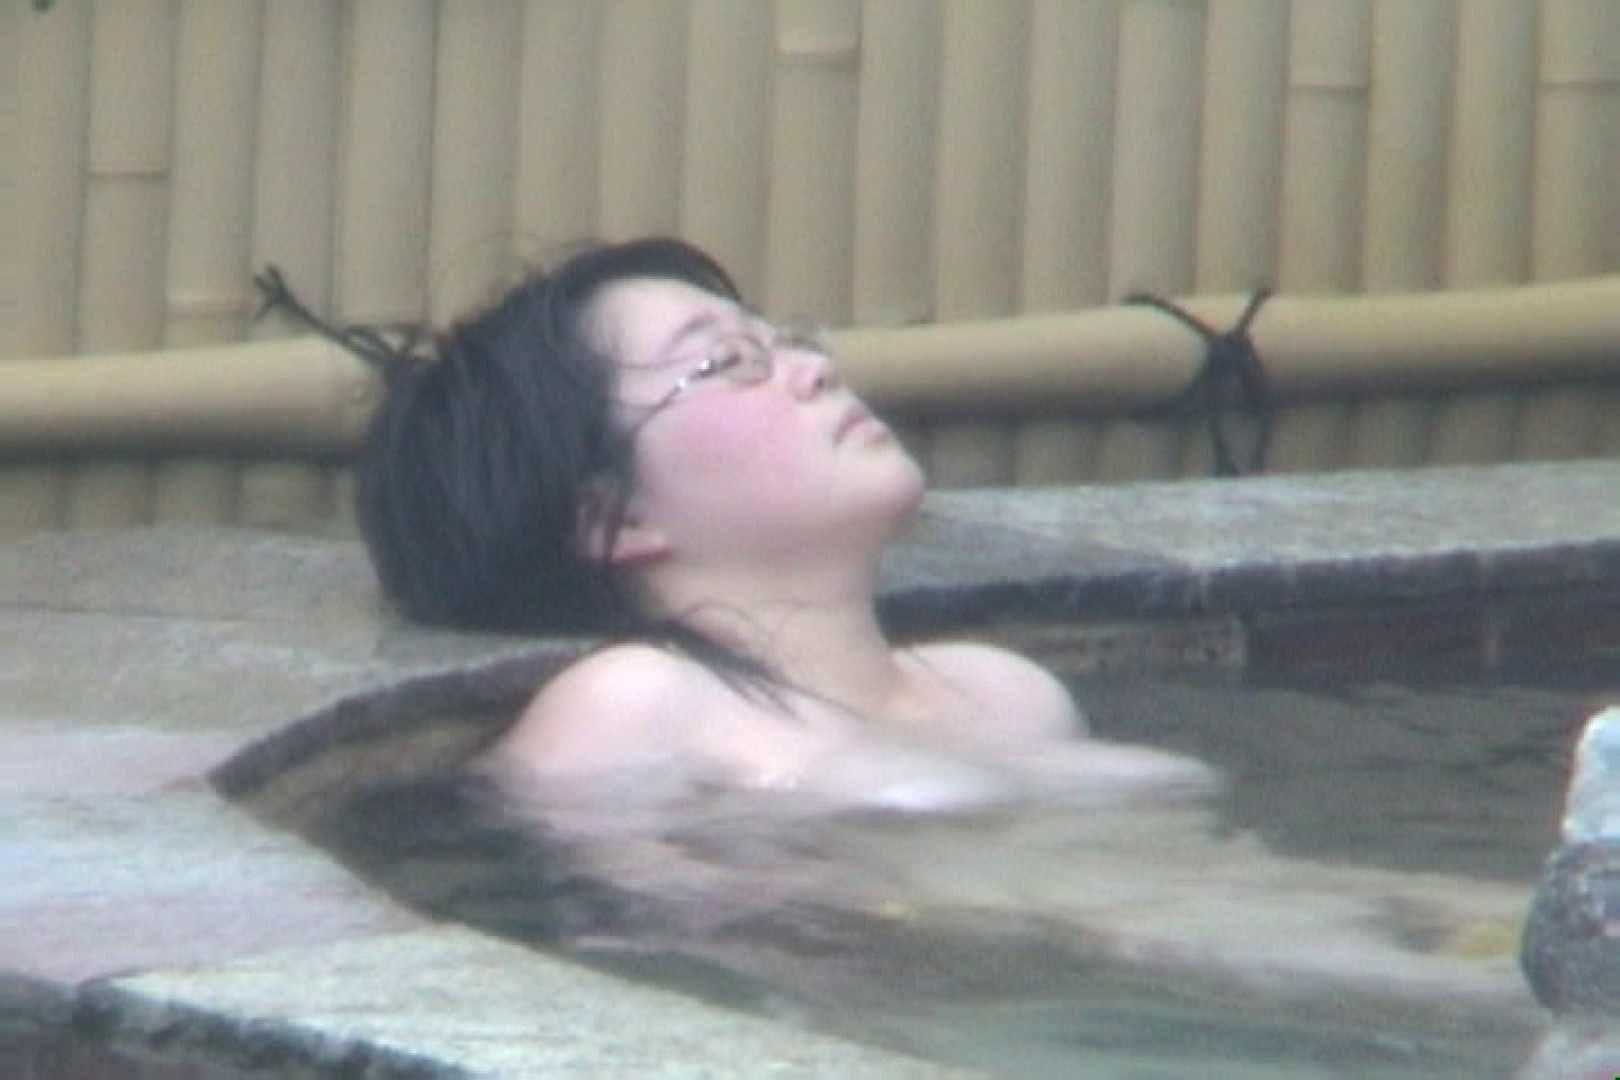 Aquaな露天風呂Vol.46【VIP限定】 いやらしいOL オマンコ動画キャプチャ 66連発 6